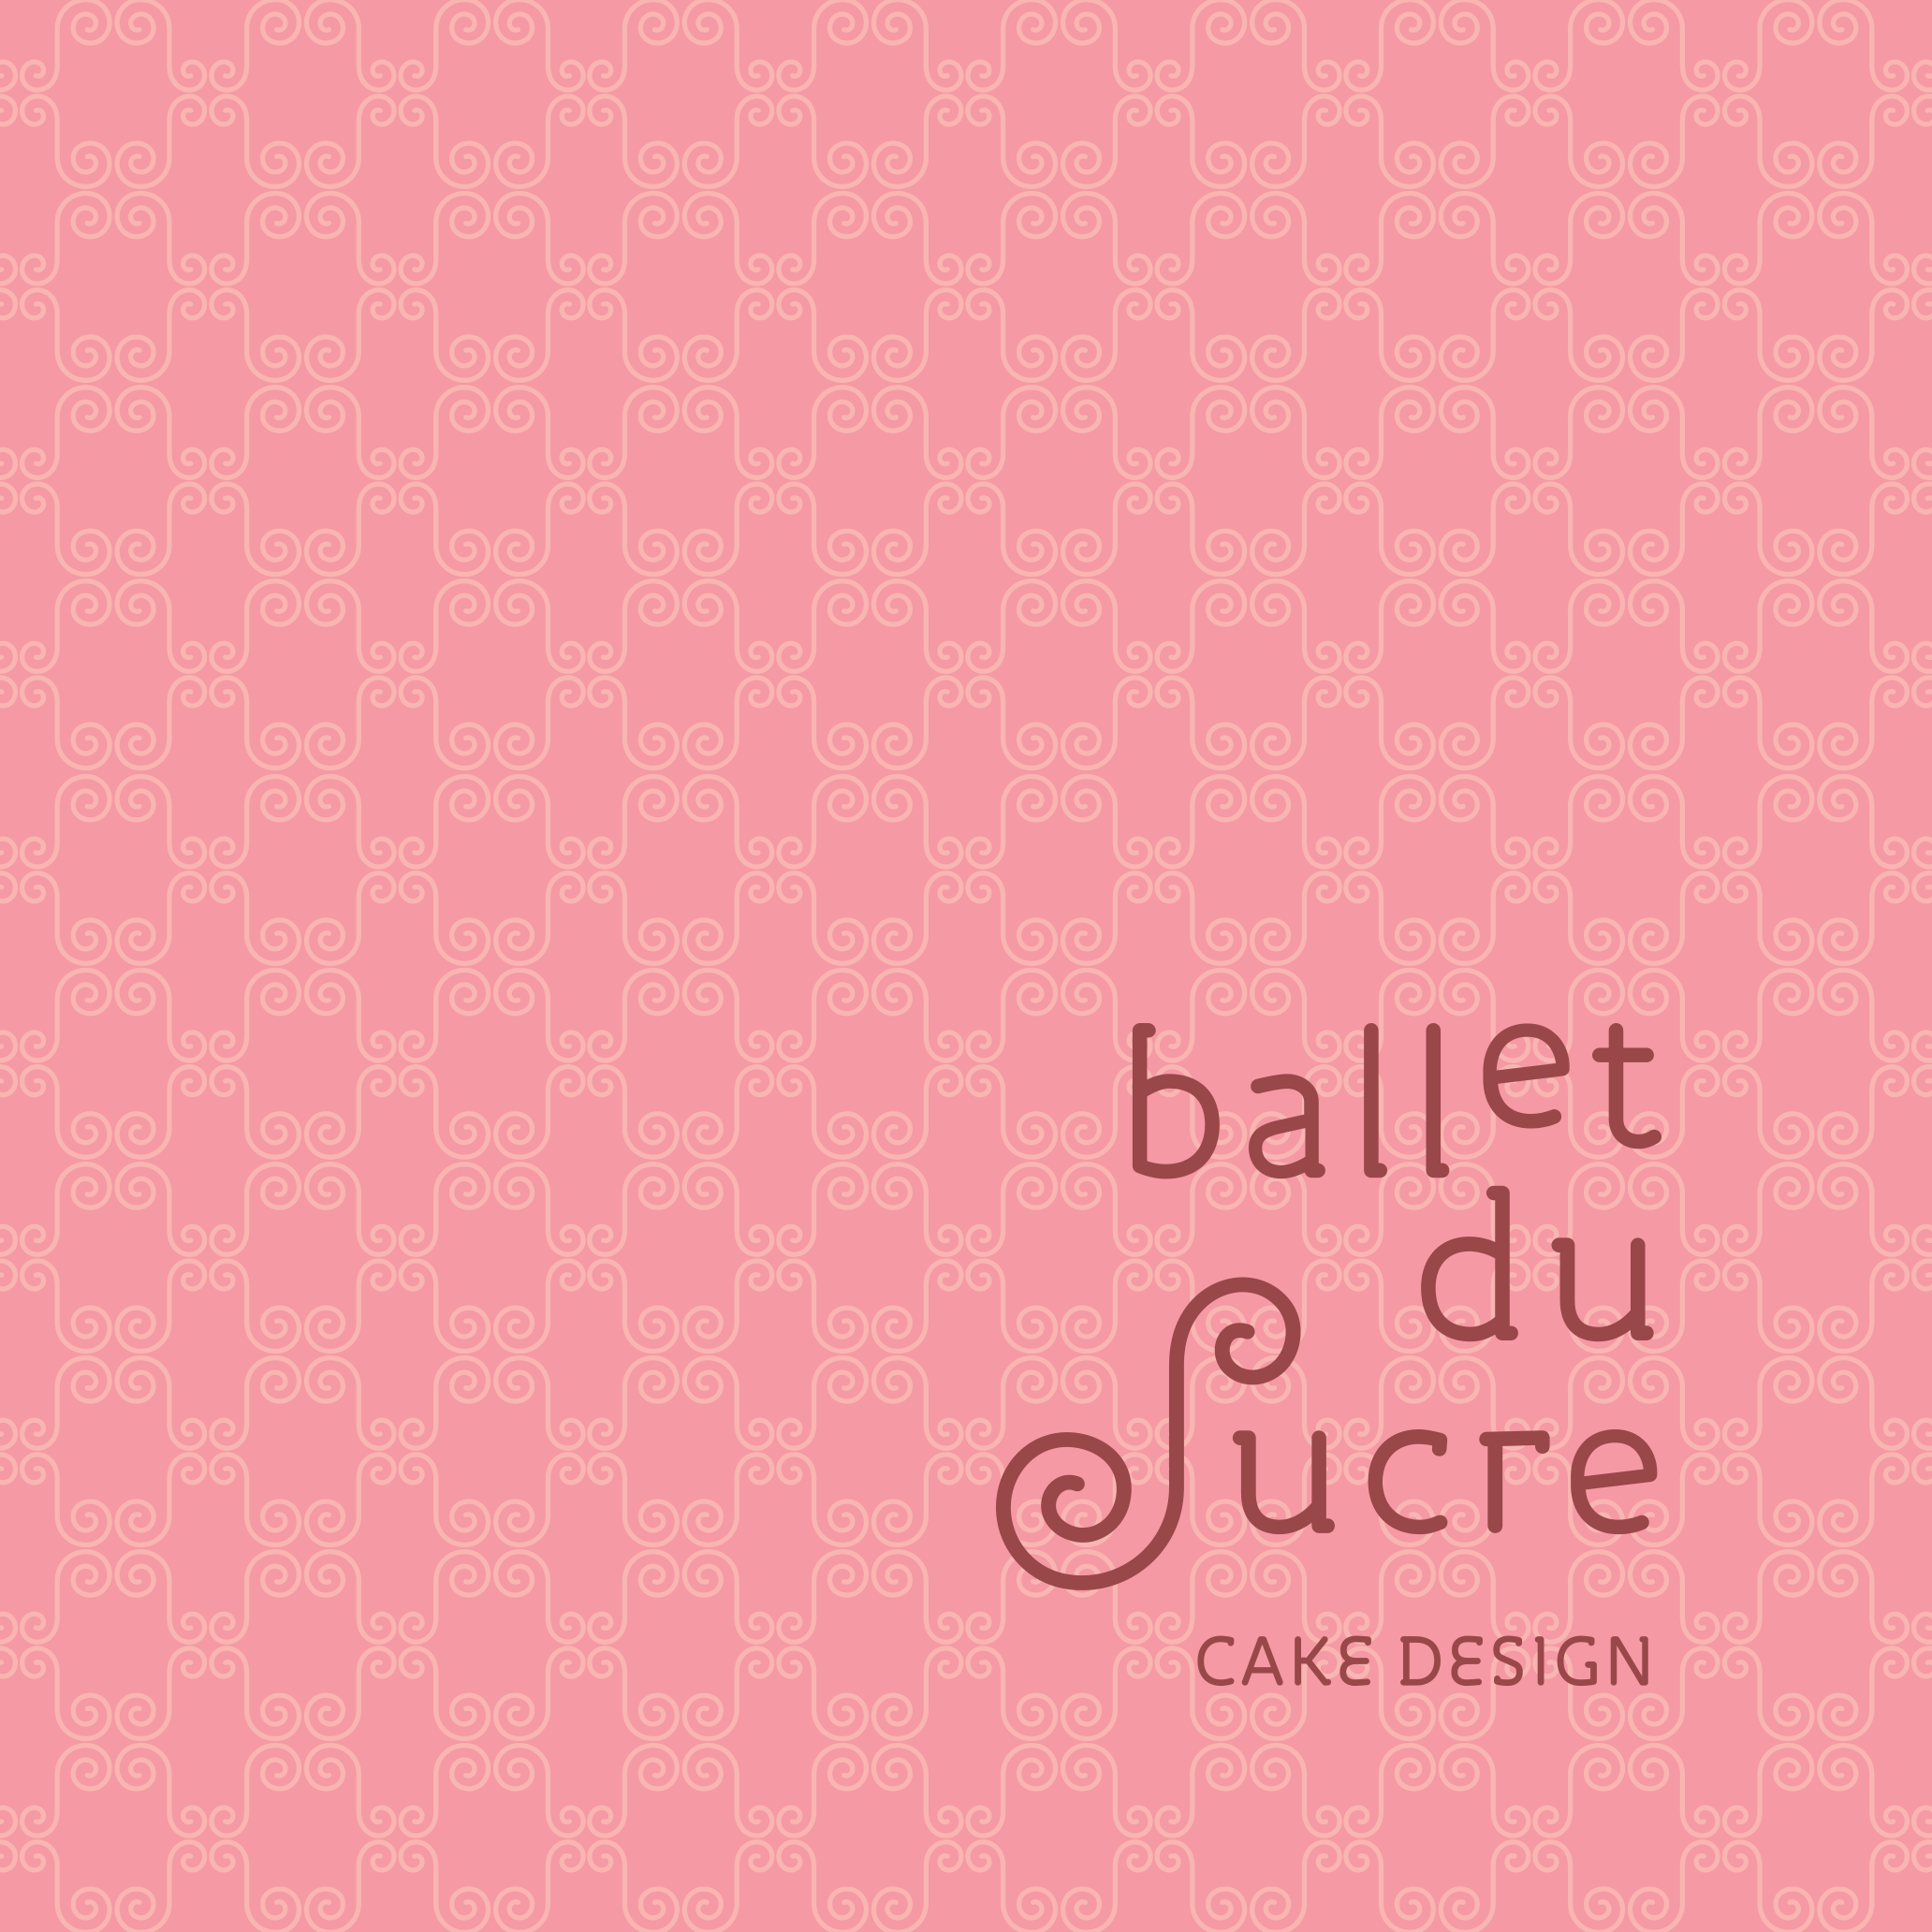 Logo + Pattern 2.